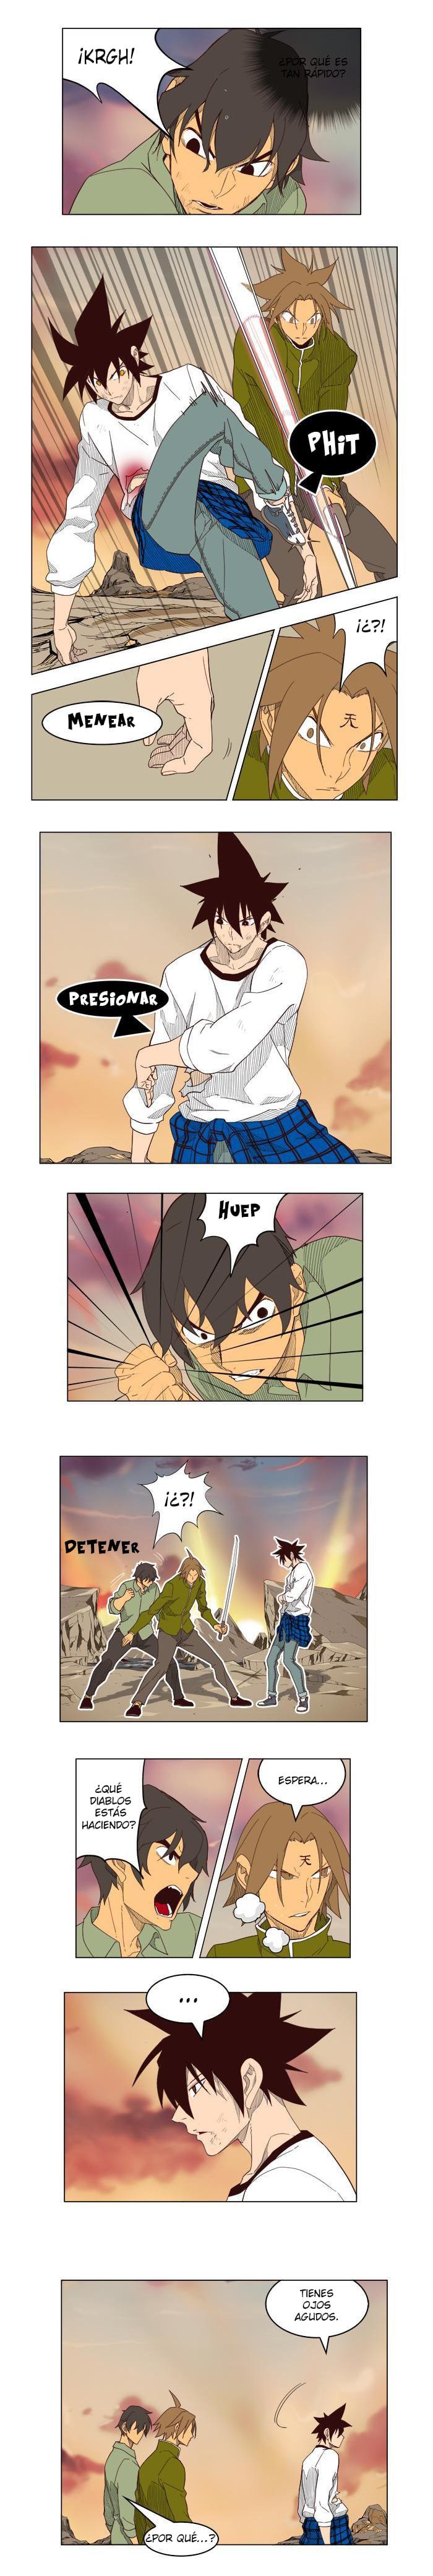 http://c5.ninemanga.com/es_manga/37/485/431954/5129a5ddcd0dcd755232baa04c231698.jpg Page 3